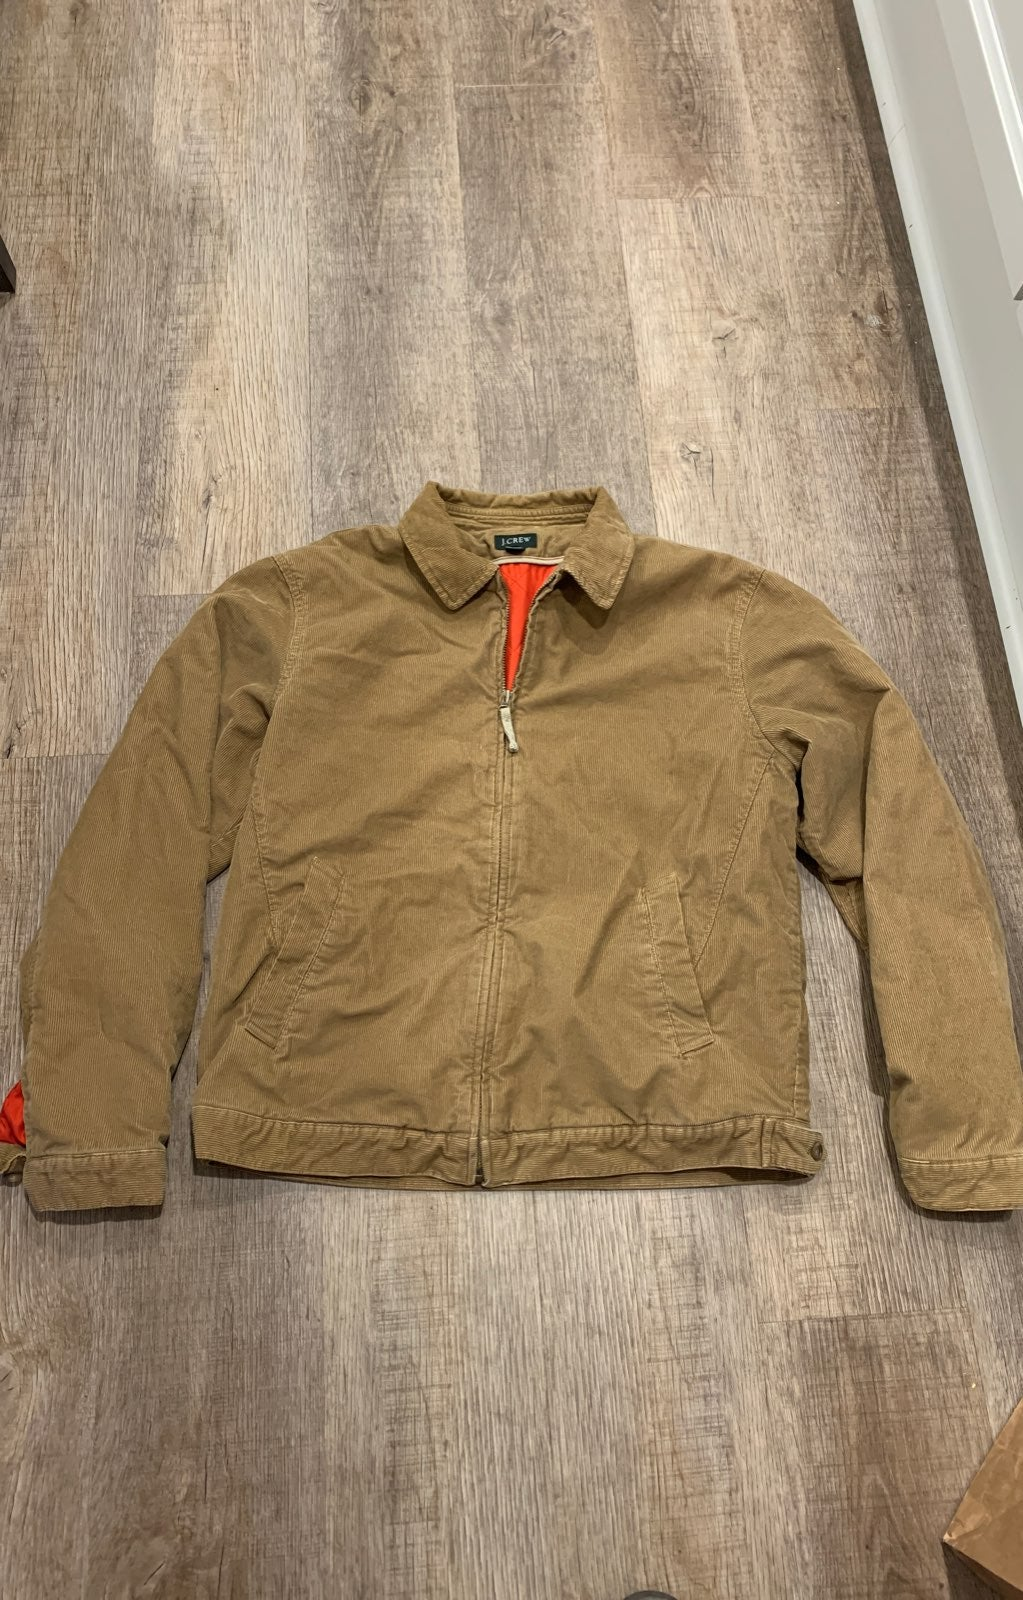 JCrew mens courduroy jacket